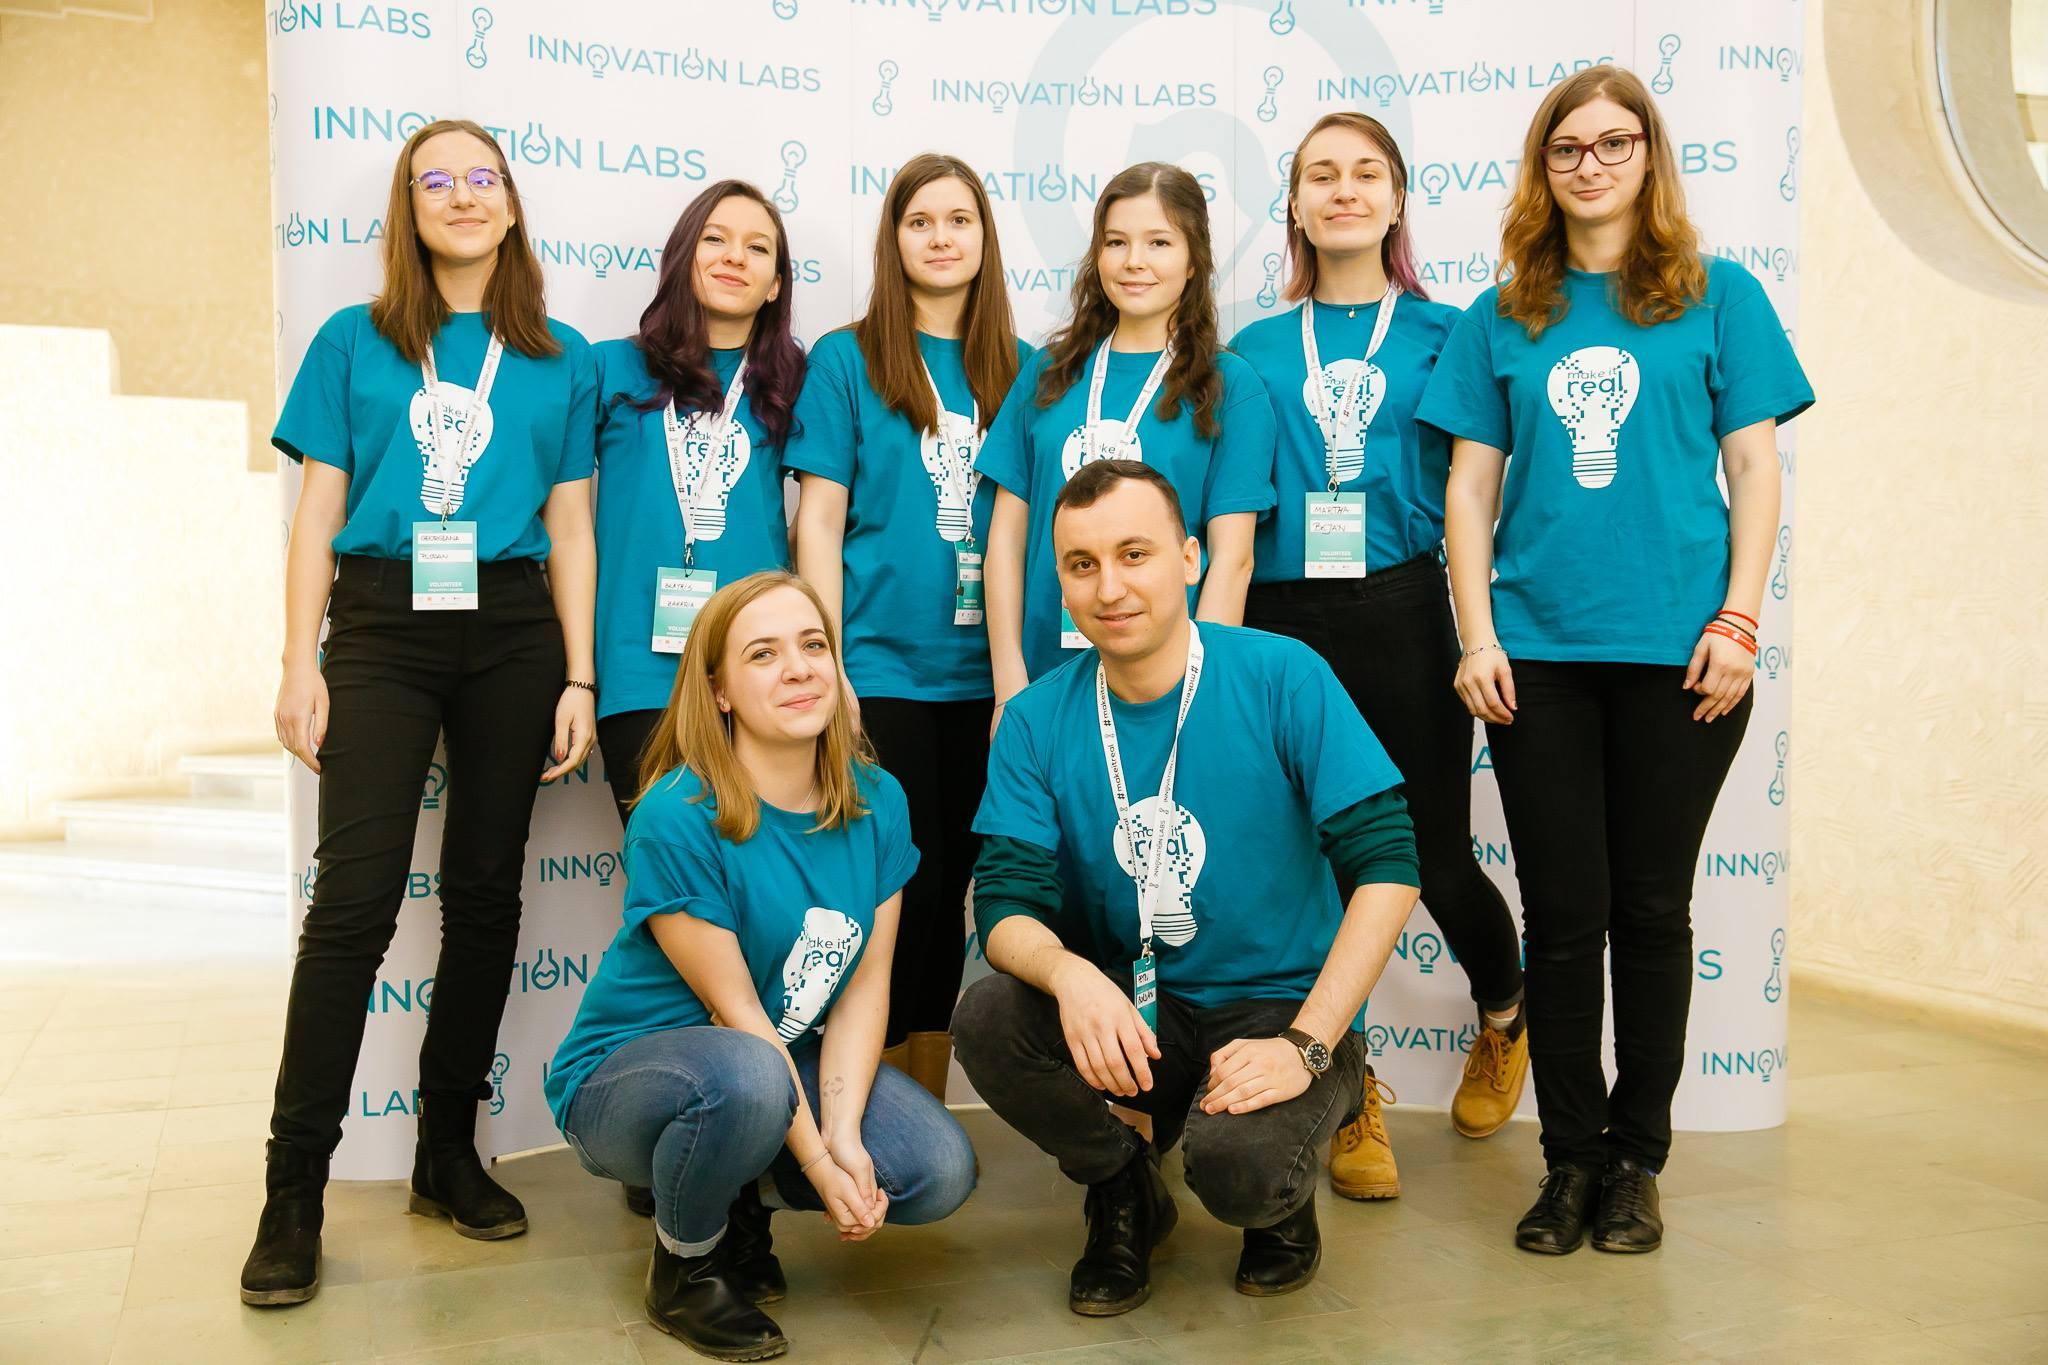 Innovation Labs 2018 Hackathon paul padurariu www.paulpadurariu.ro fotograf profesionist evenimente Iasi 40